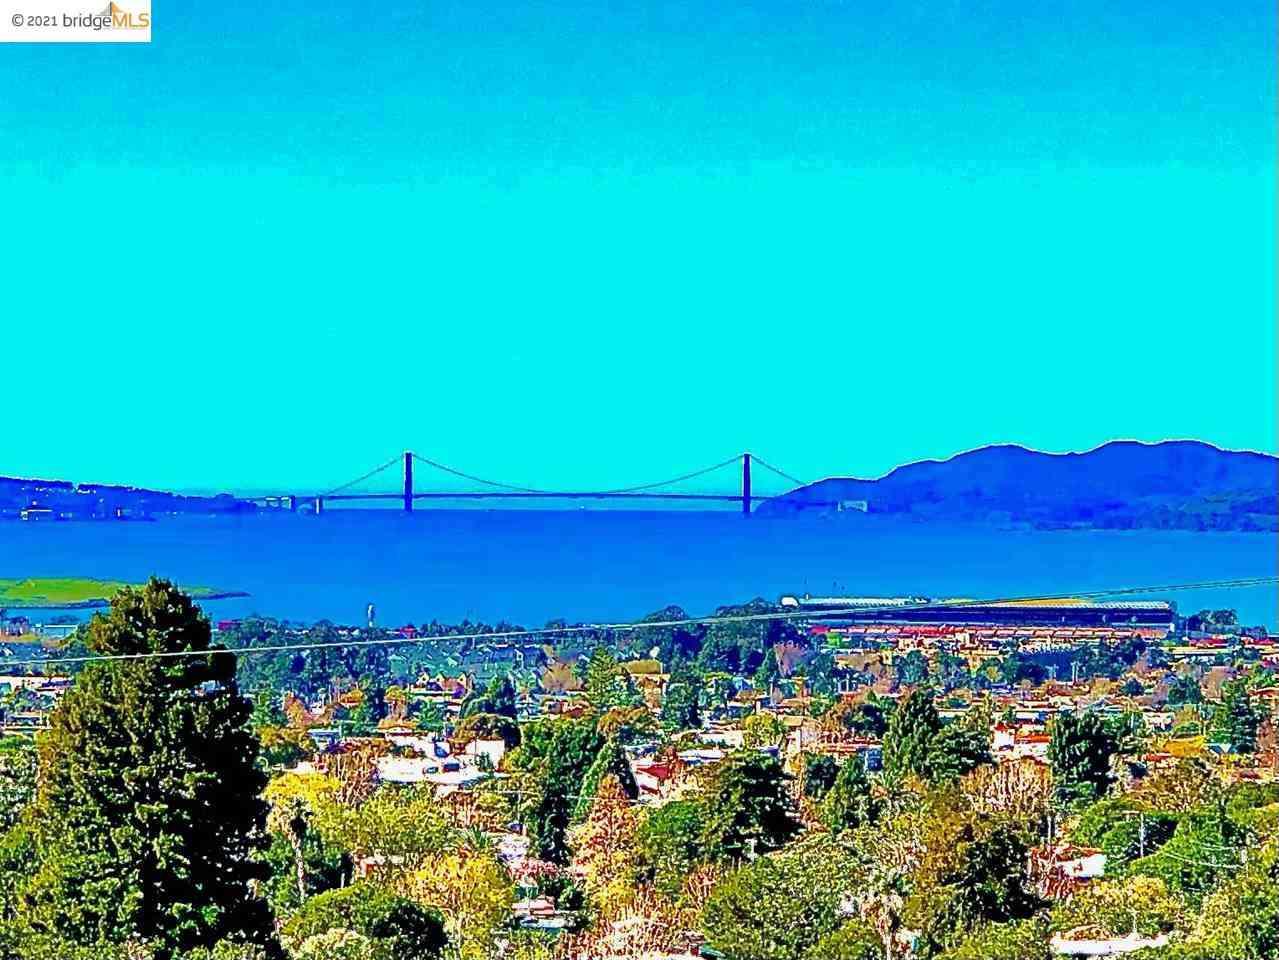 753 CONTRA COSTA AVENUE, Berkeley, CA, 94707,